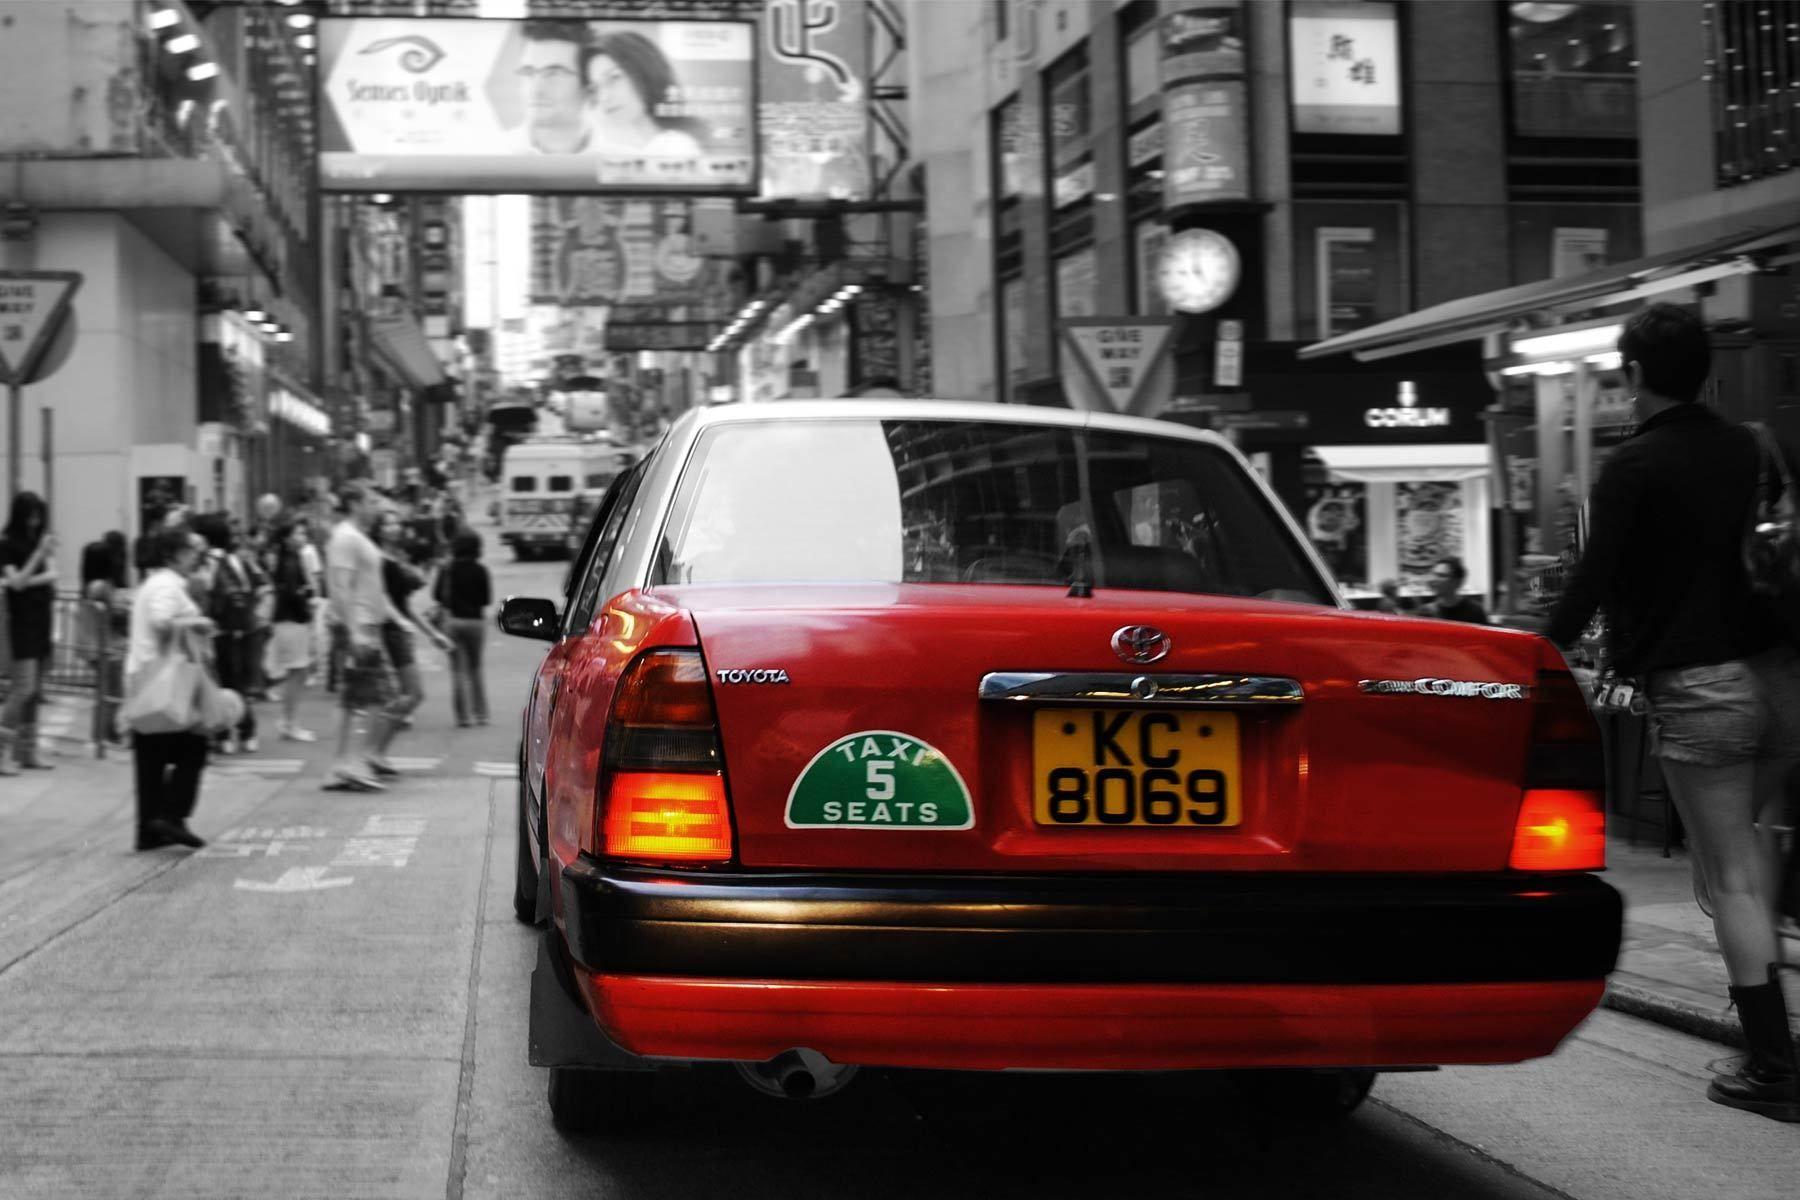 100___hk___taxi.jpg